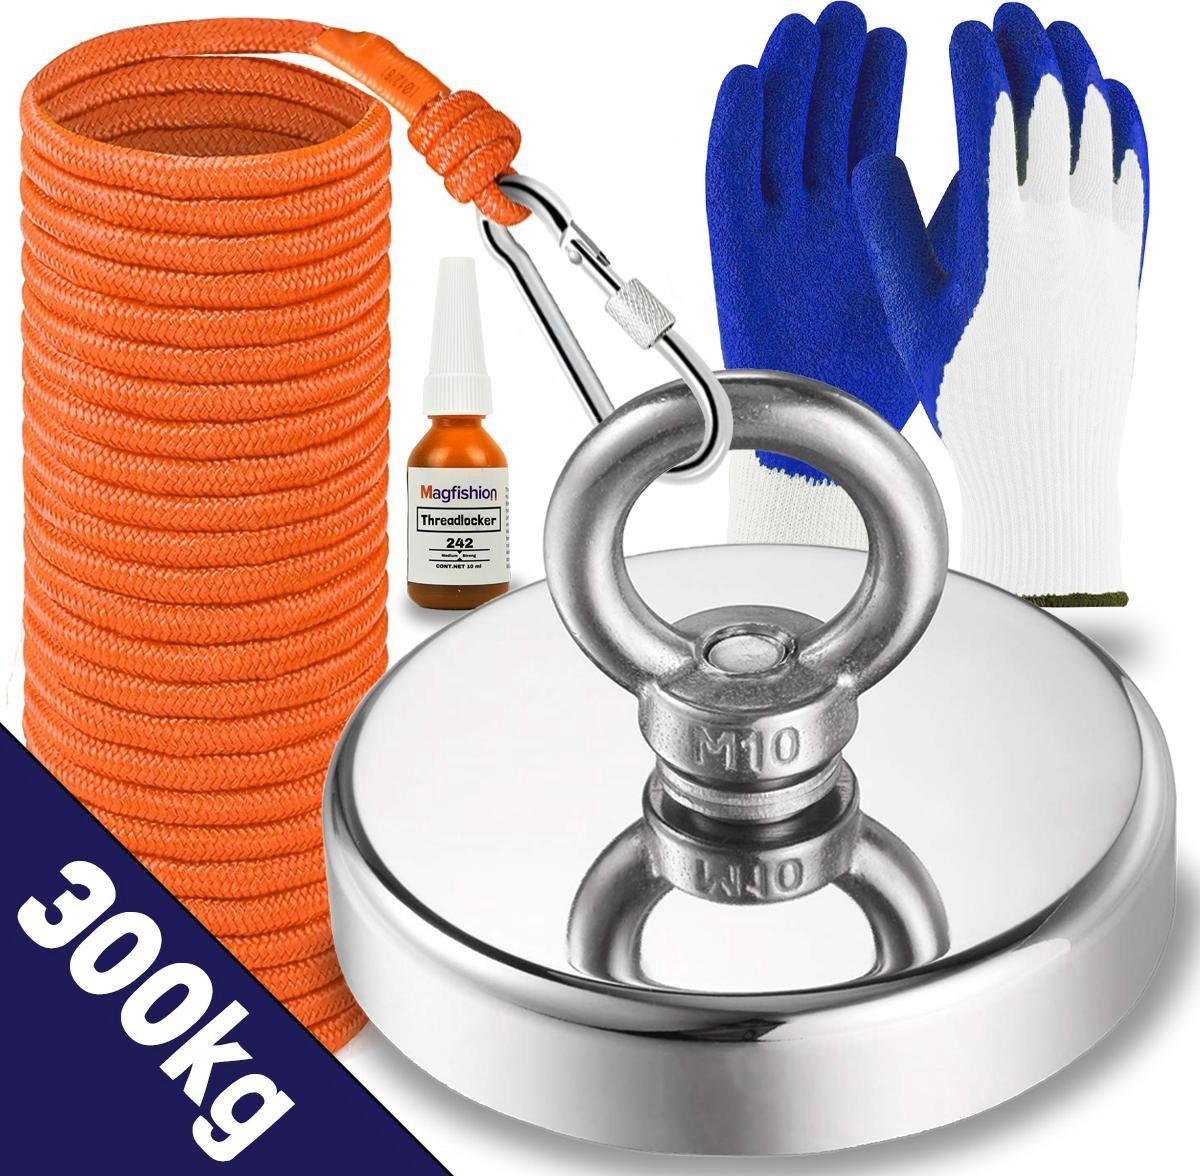 Magfishion® Vismagneet Set - 300 KG - Magneetvissen - 20m Touw + Karabijnhaak met Schroefsluiting -